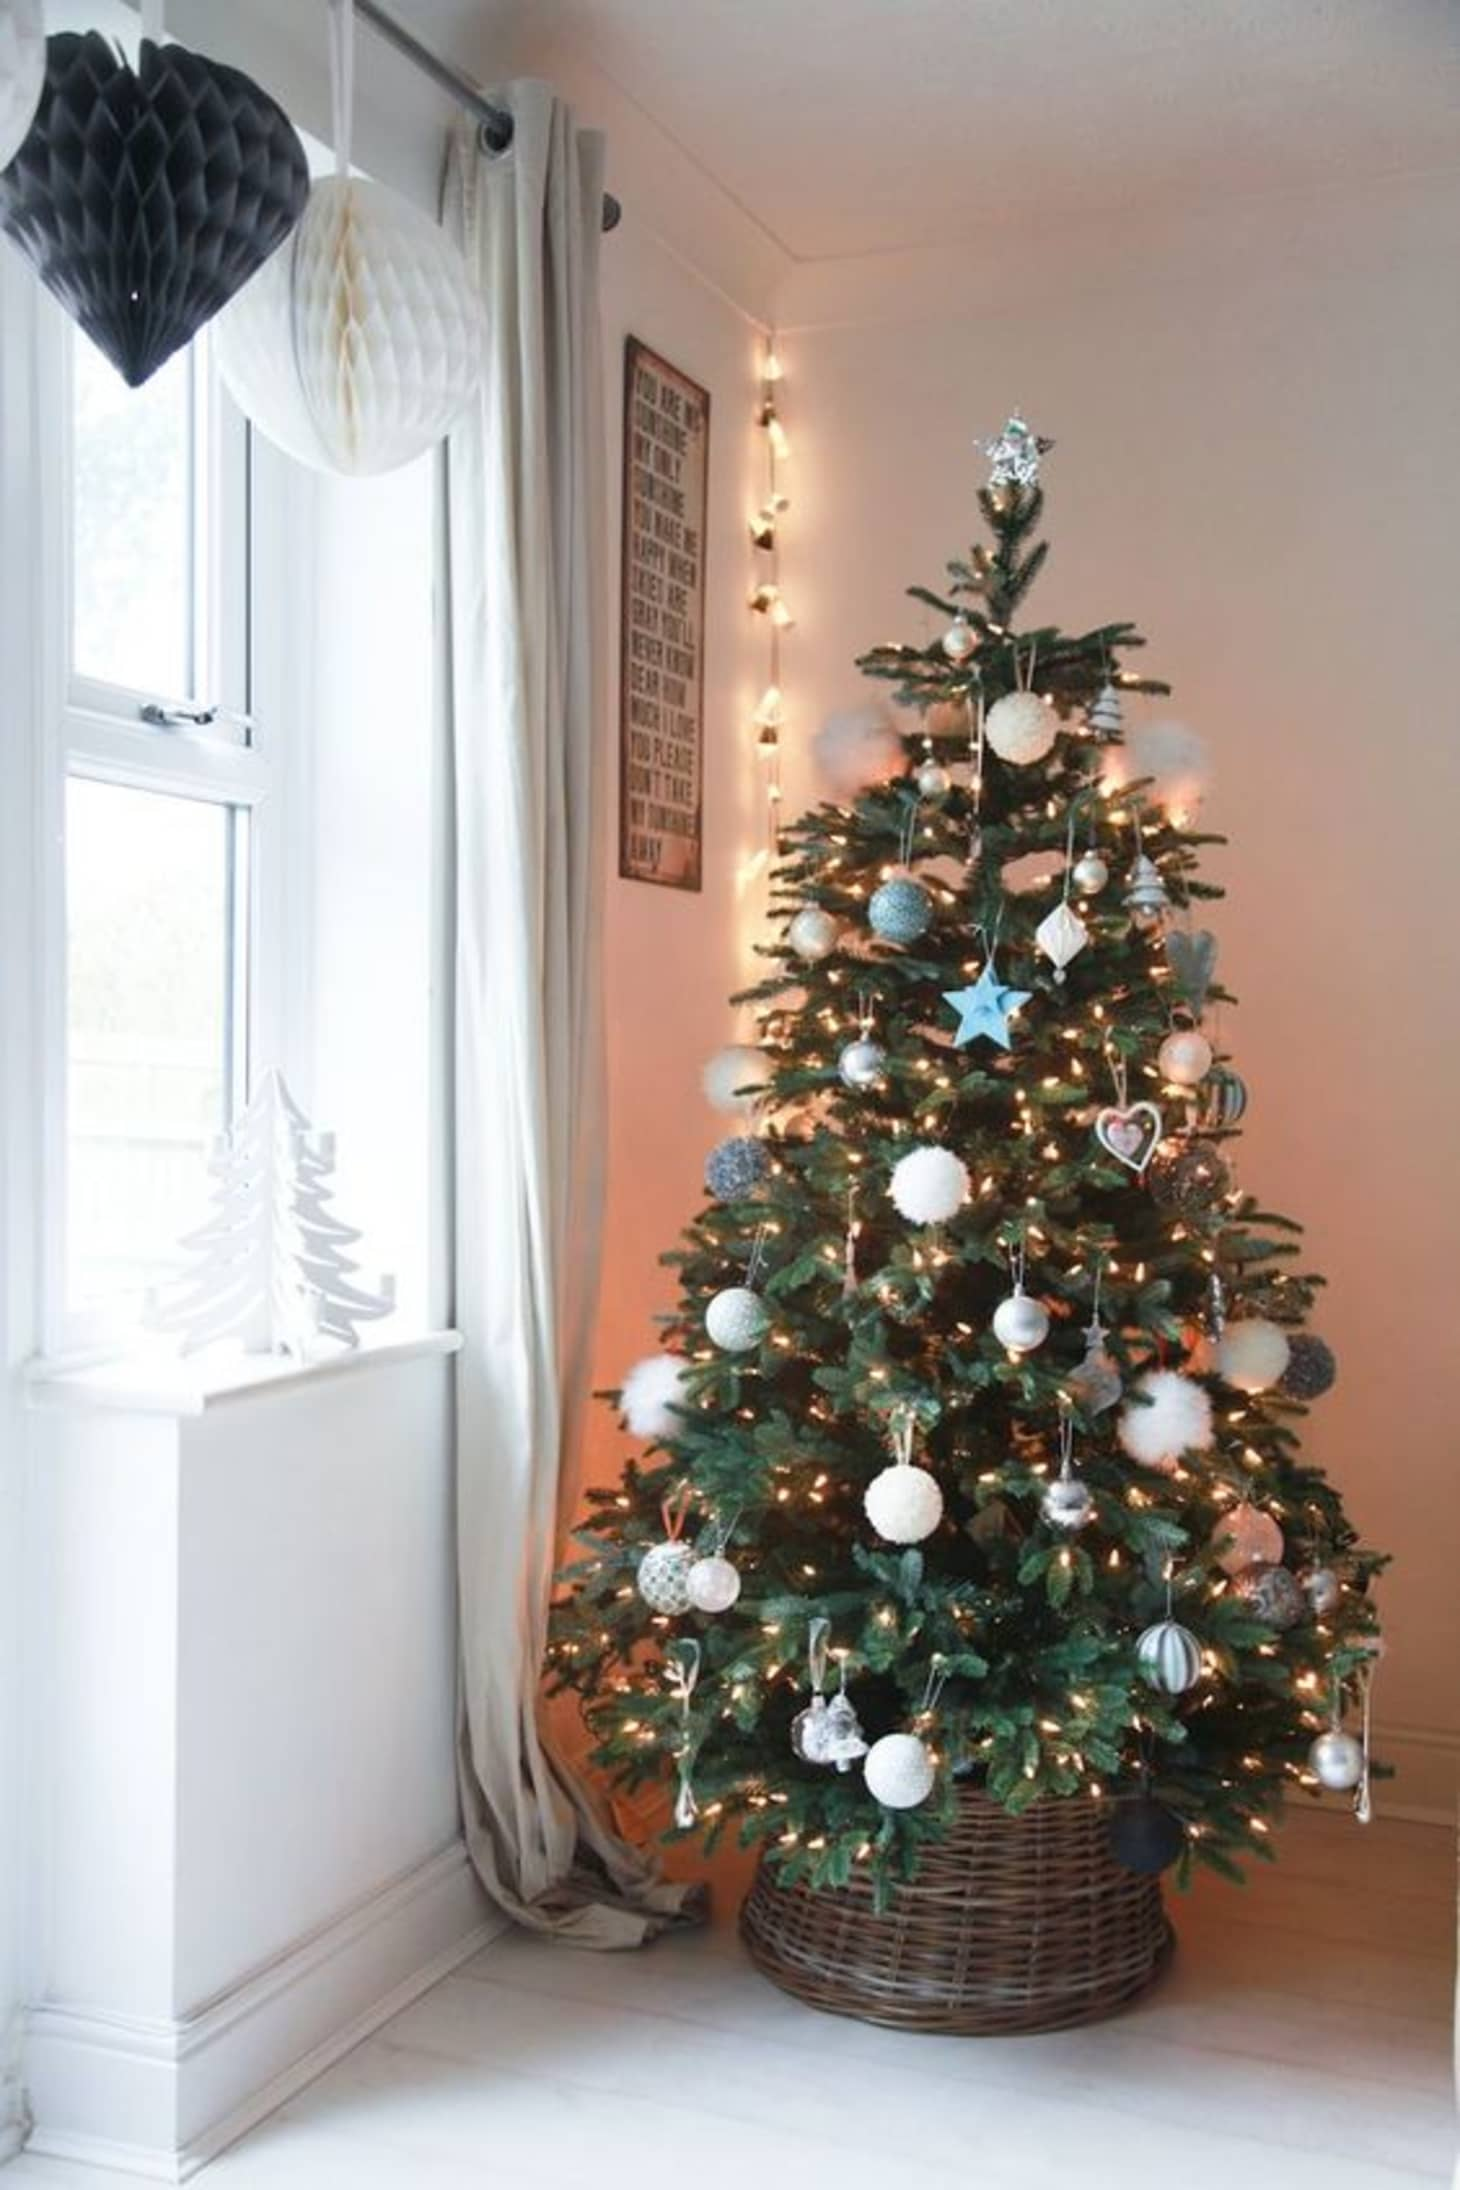 Christmas Tree Skirt Alternatives: Tree in a Basket ...